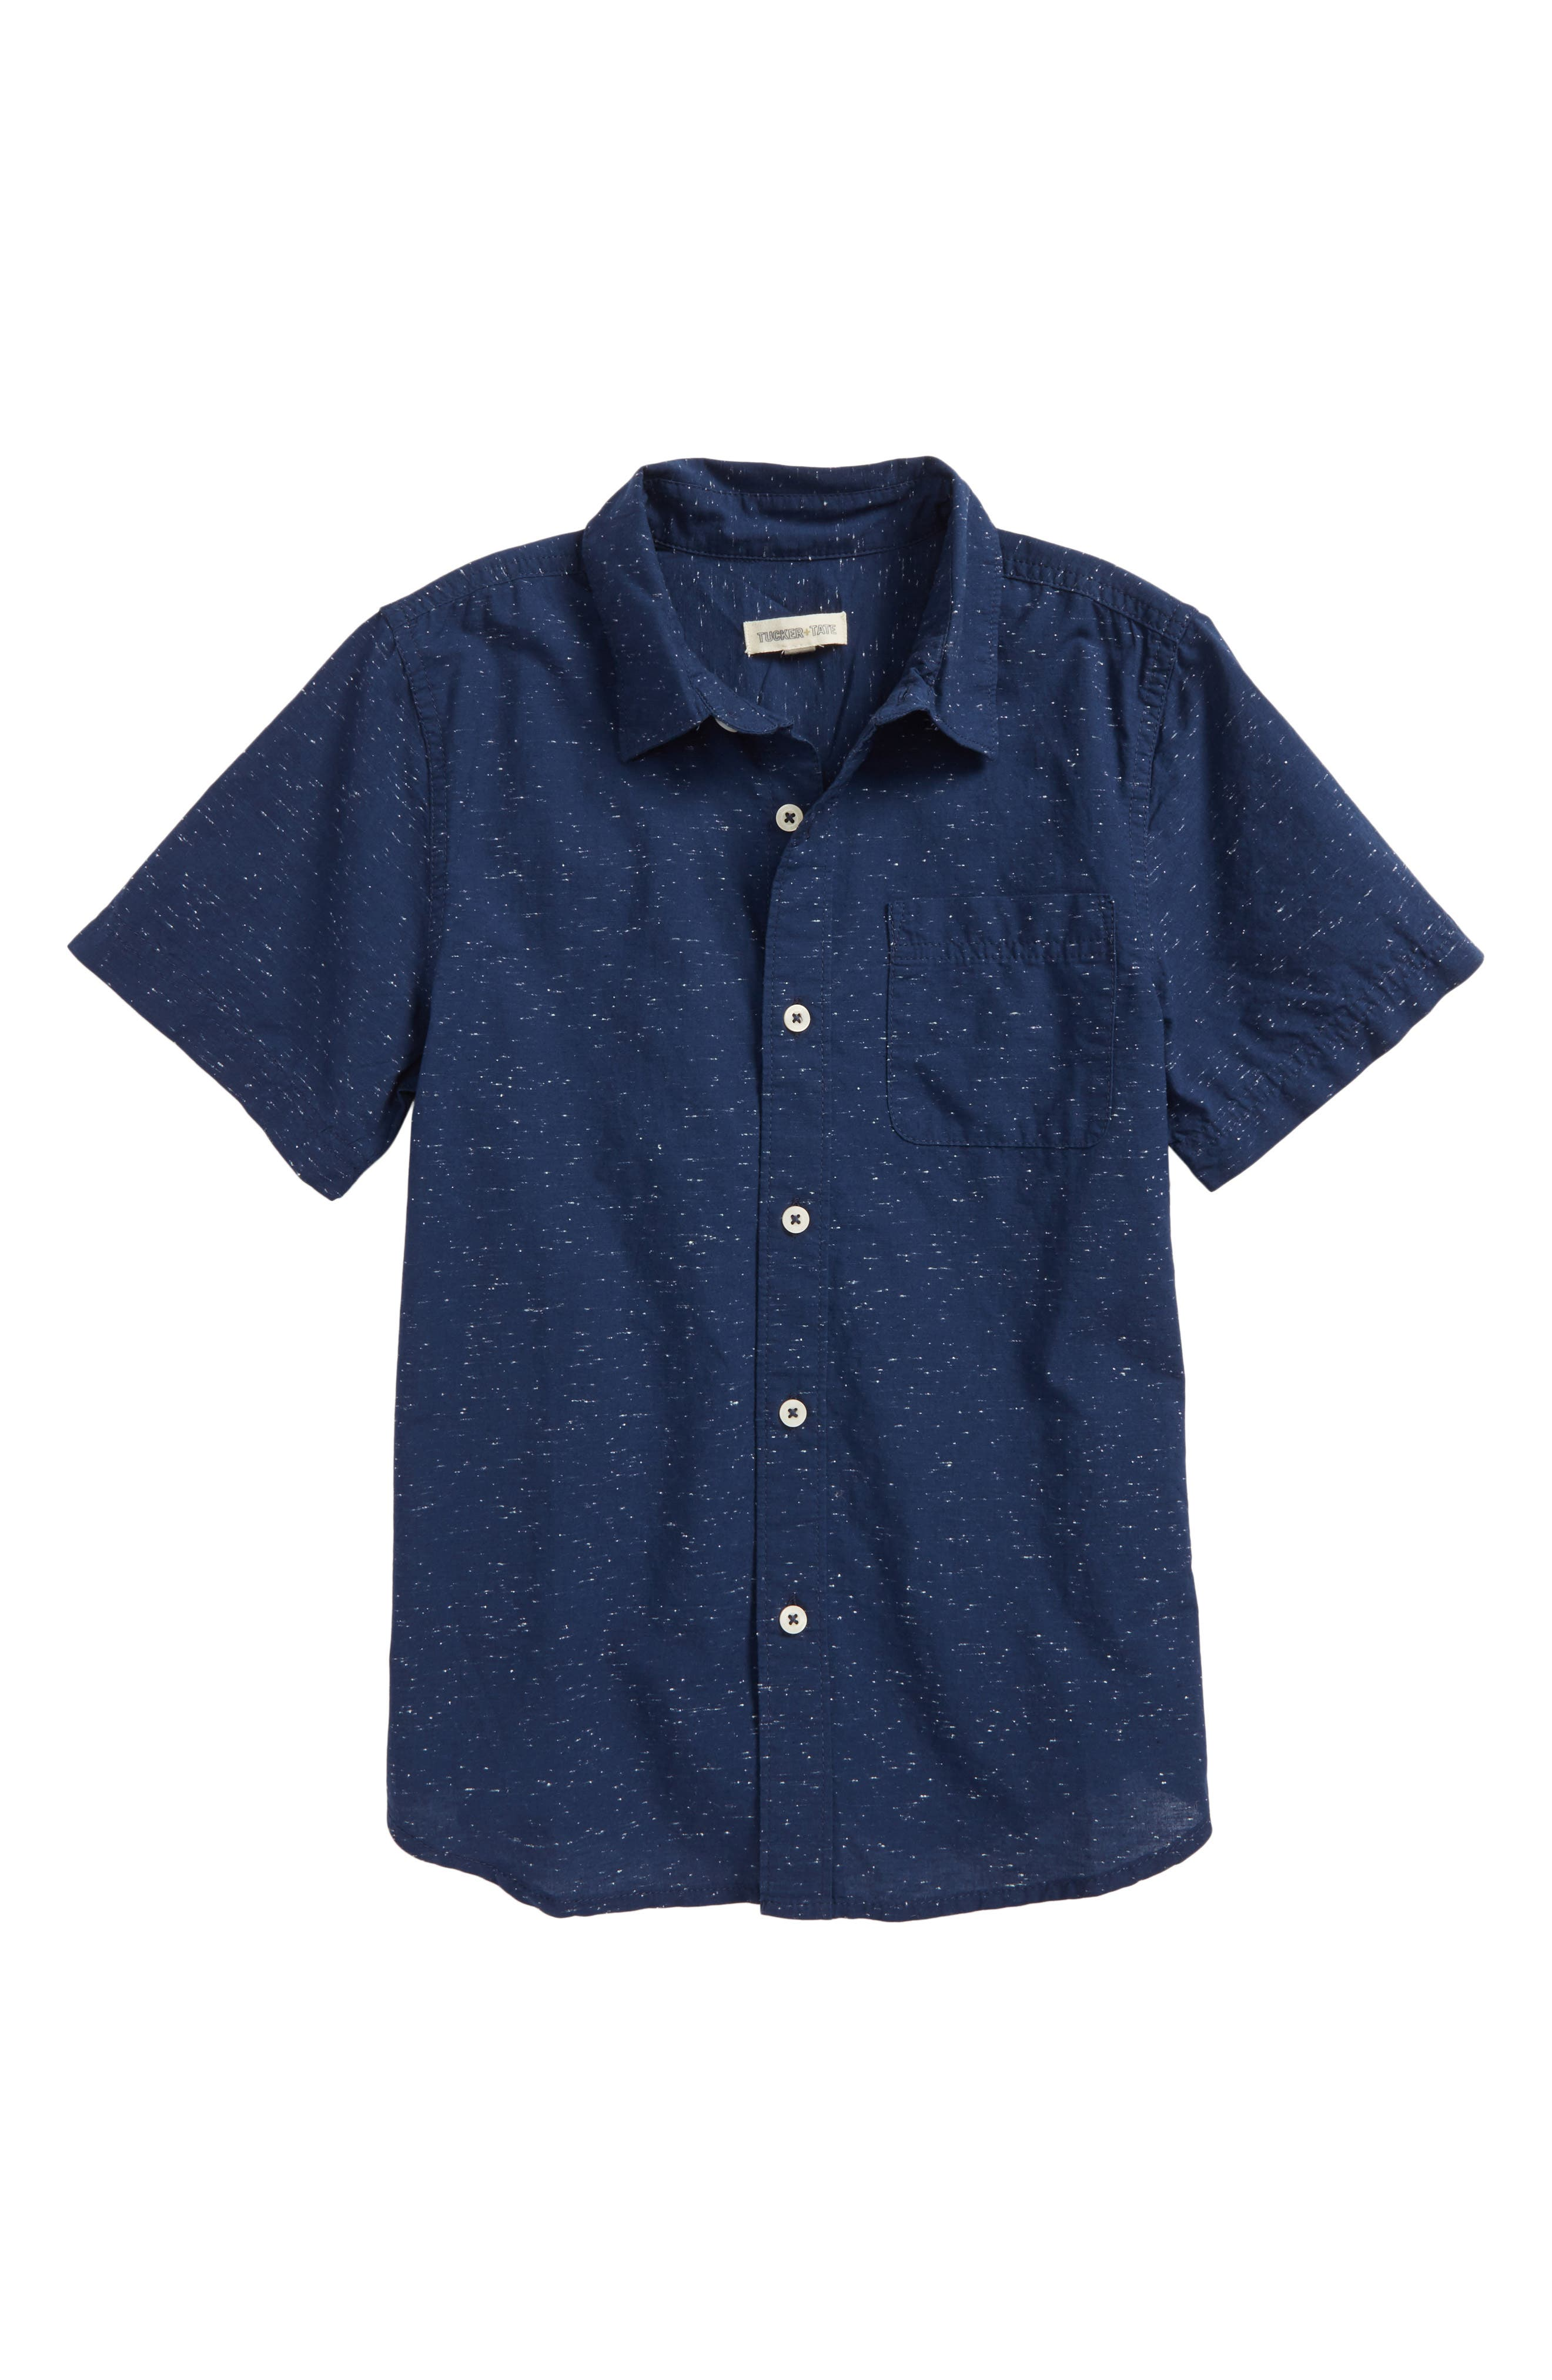 Main Image - Tucker + Tate Slub Woven Shirt (Big Boys)